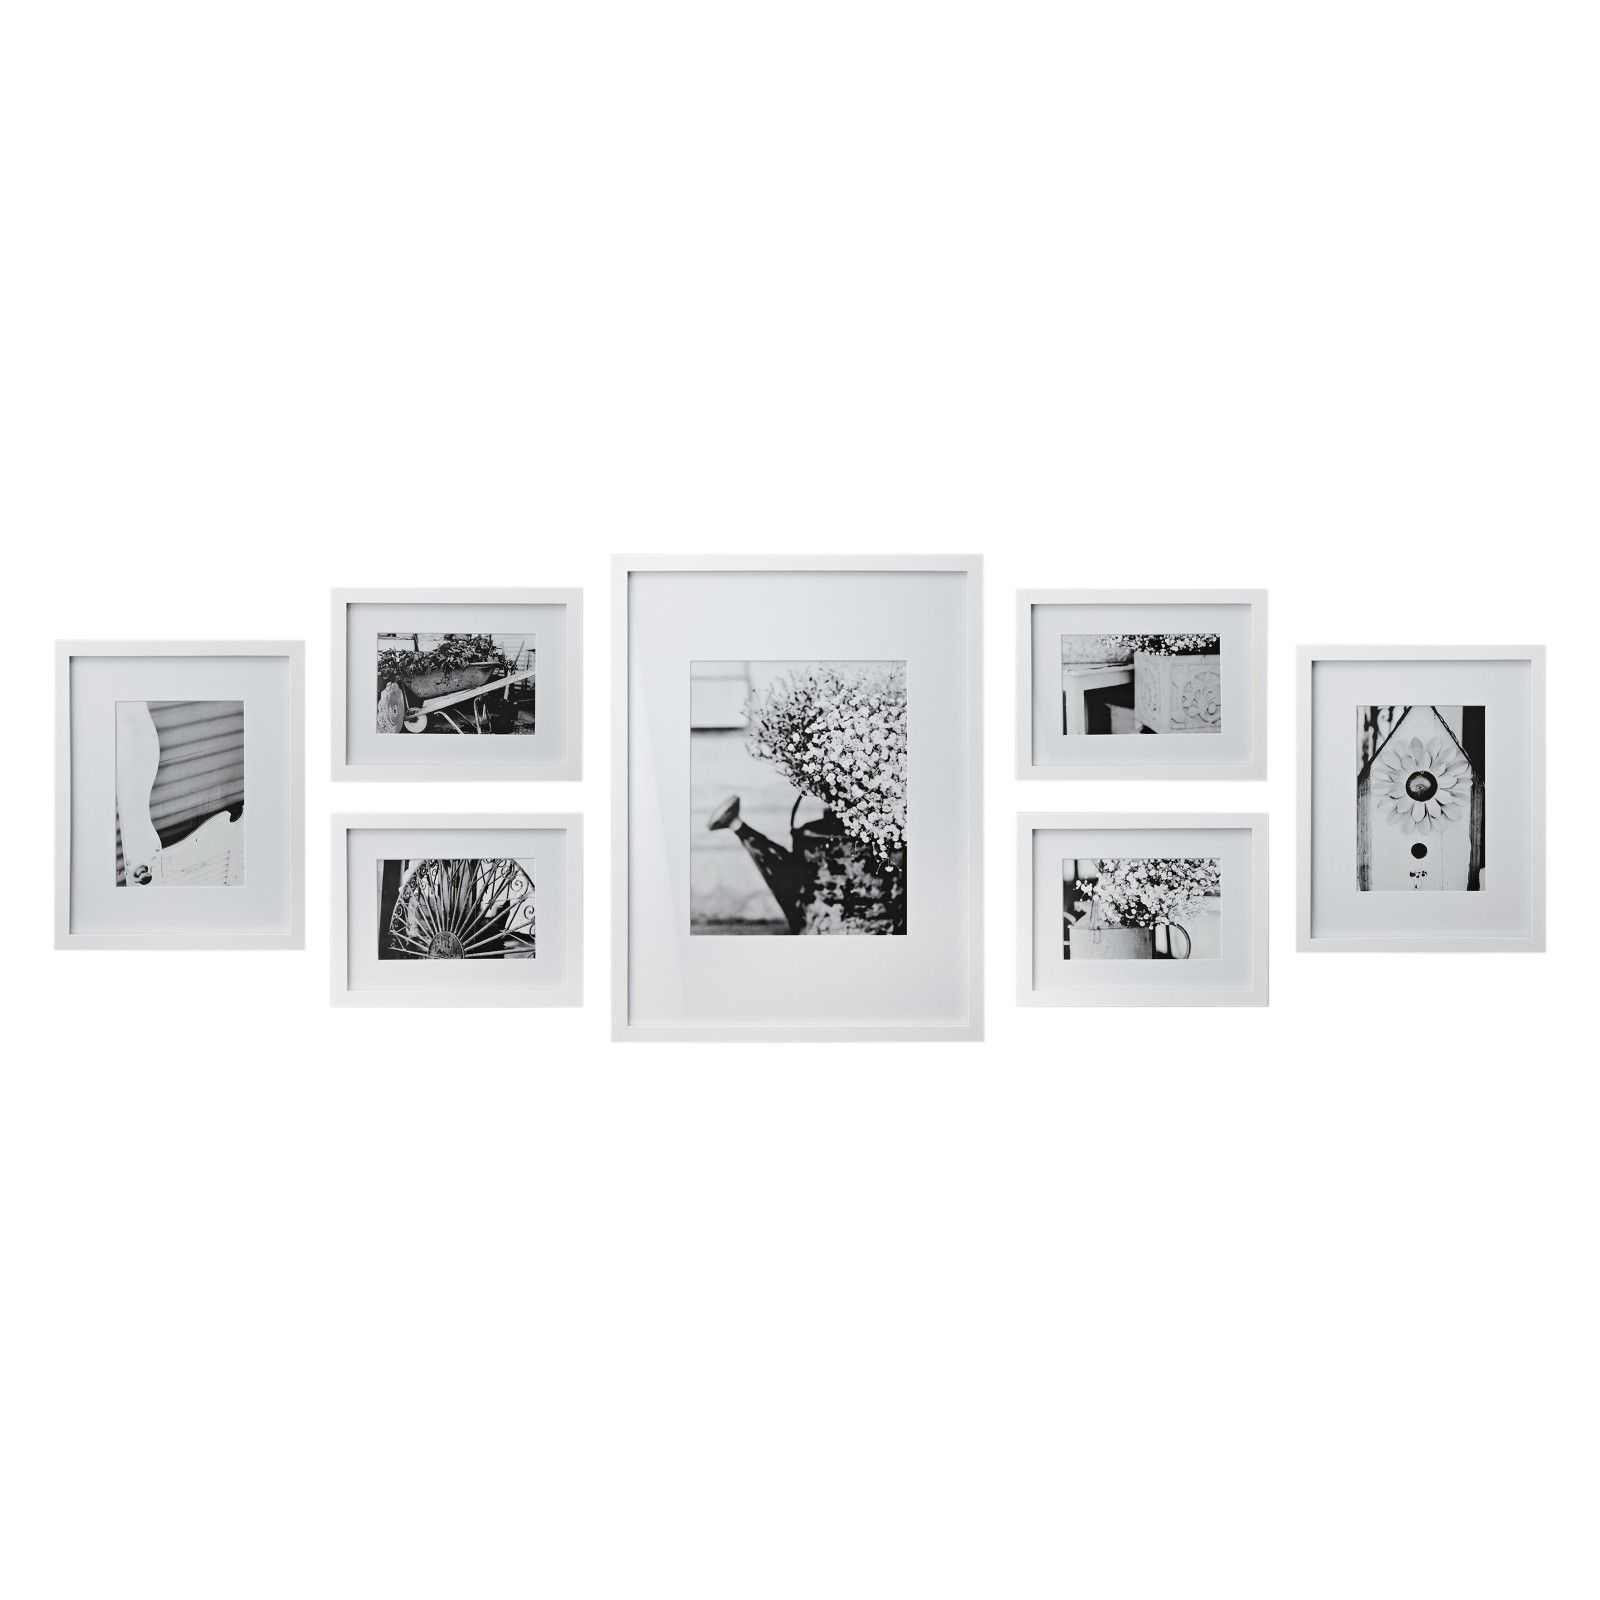 John Lewis Black Photo Frame Set | Frameswalls.org